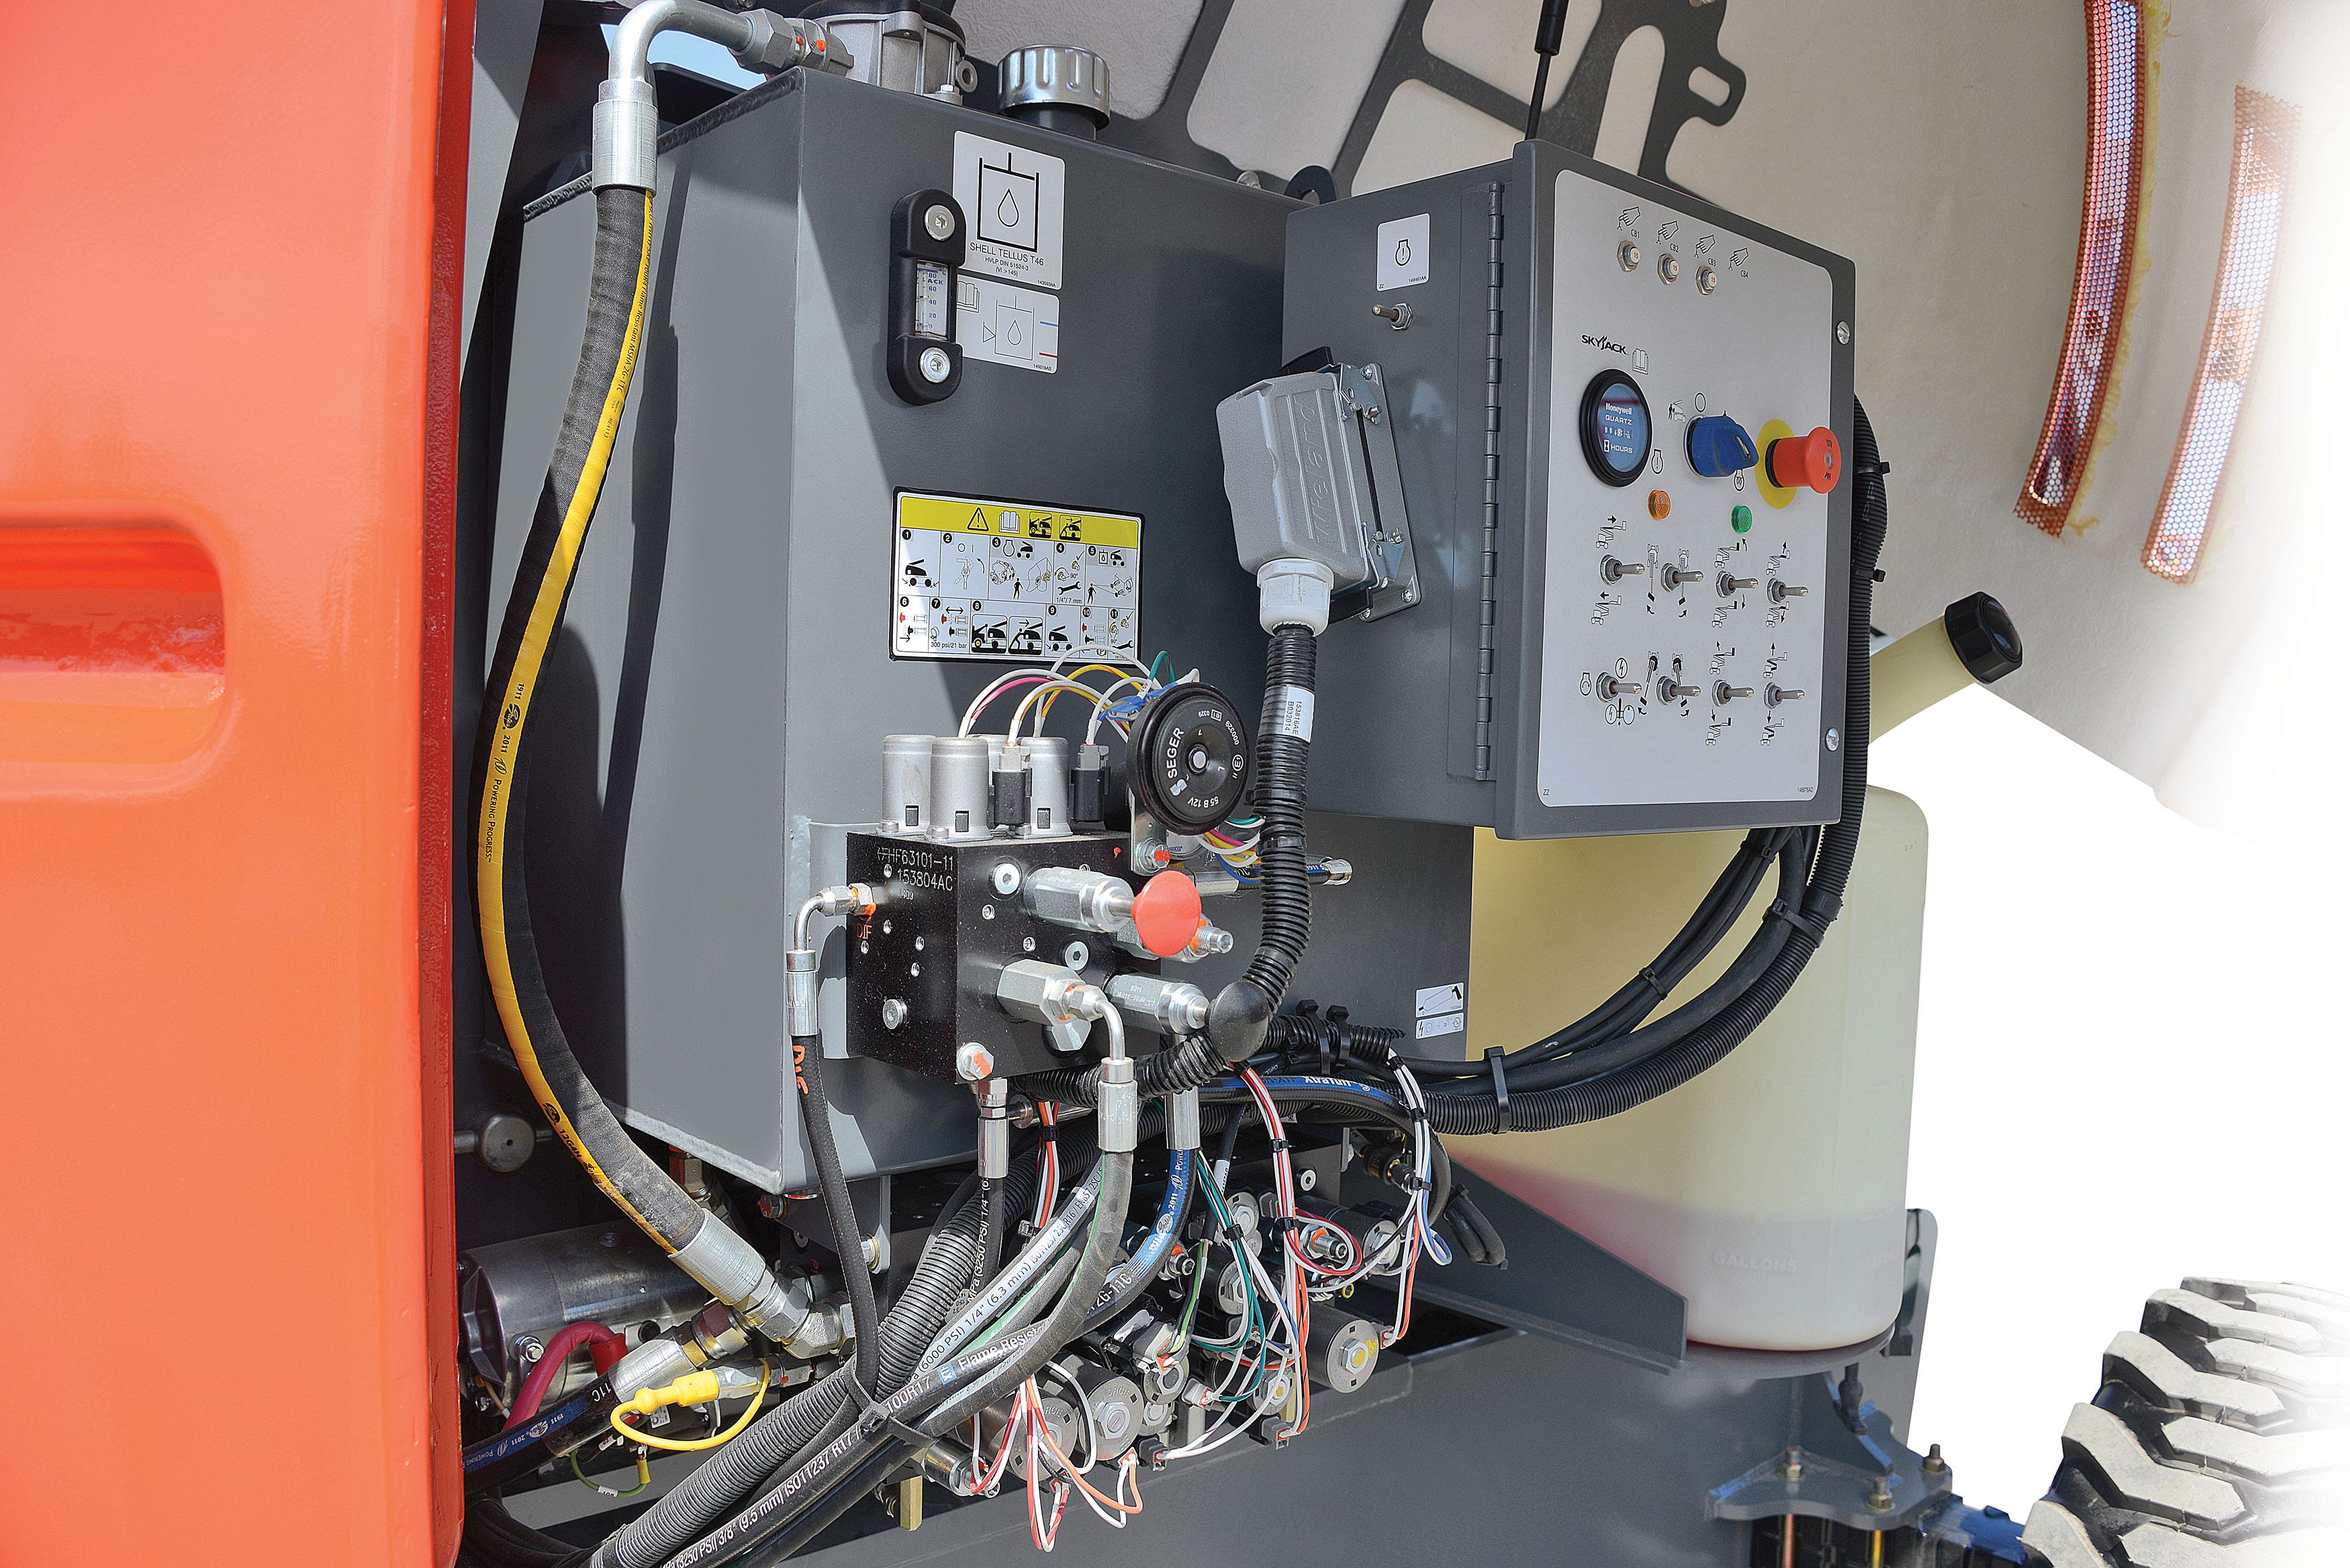 Hydraulic SystemANSI sj30 aje arje skyjack access platform andover forktruck services skyjack 3219 wiring diagram at eliteediting.co